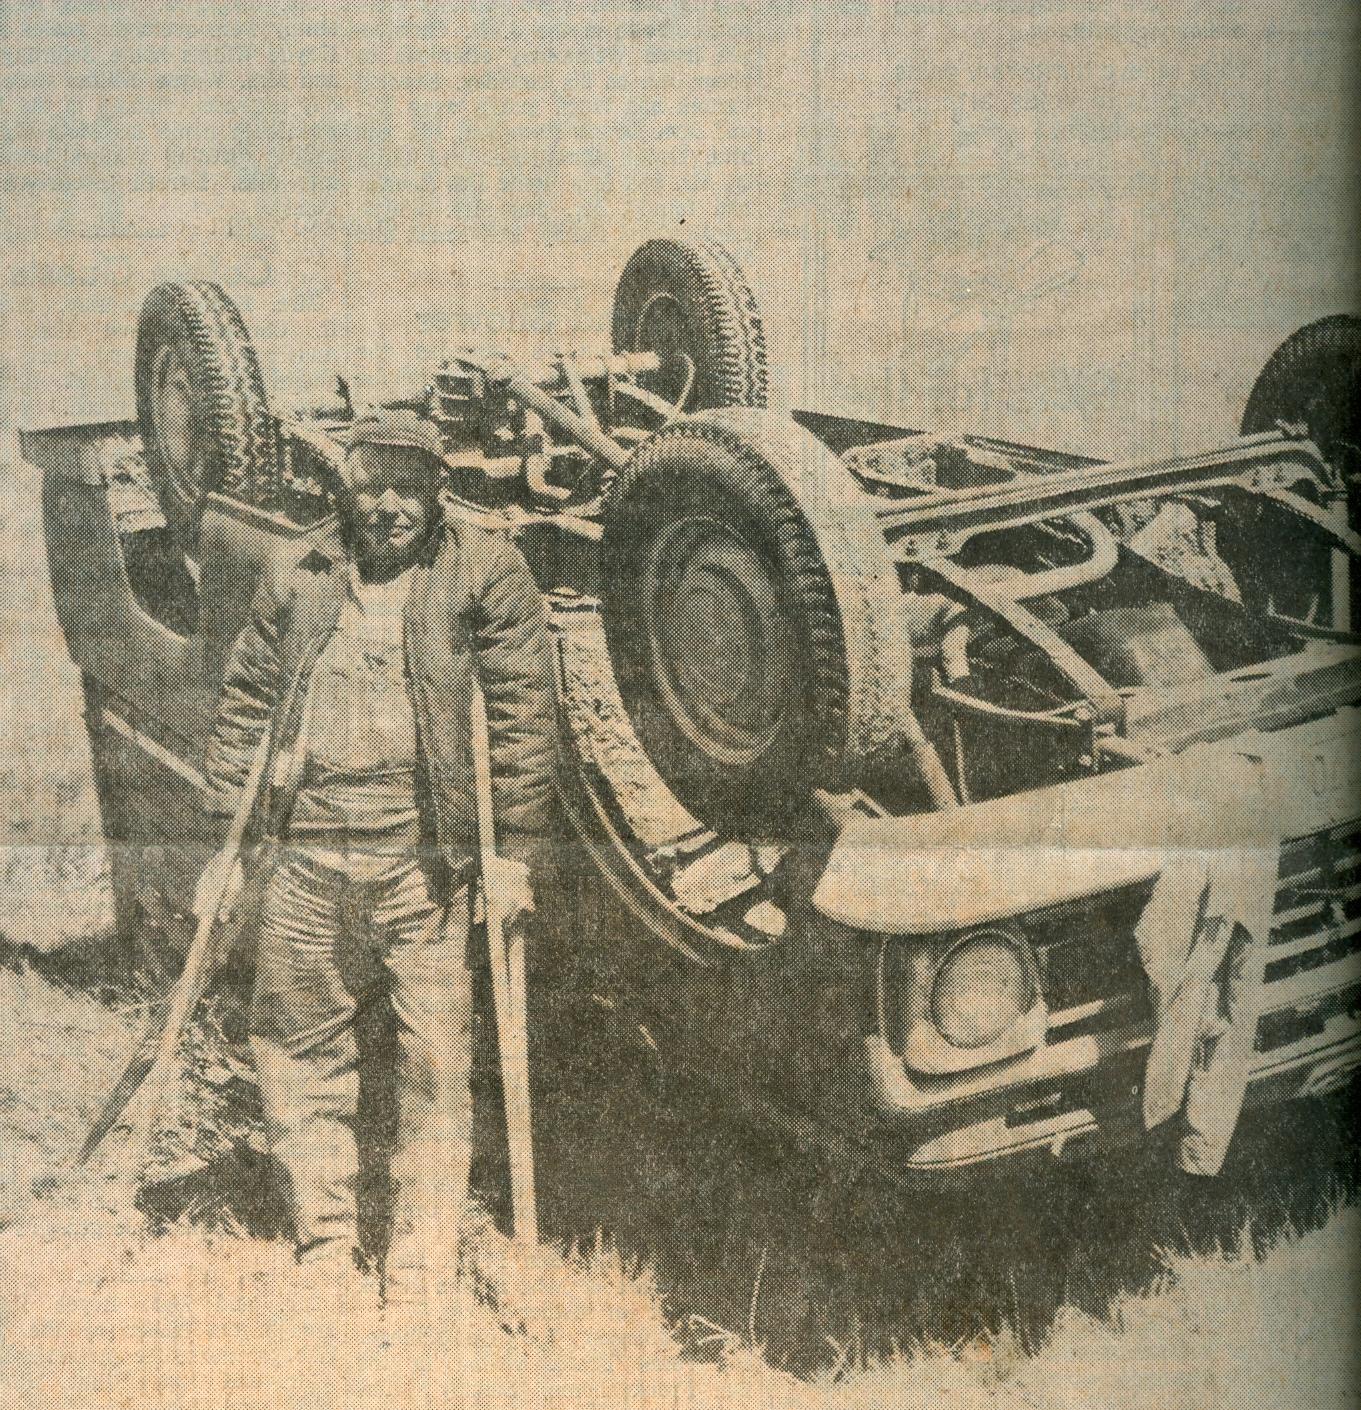 Tripp County, SD F5 Tornado – May 8, 1965